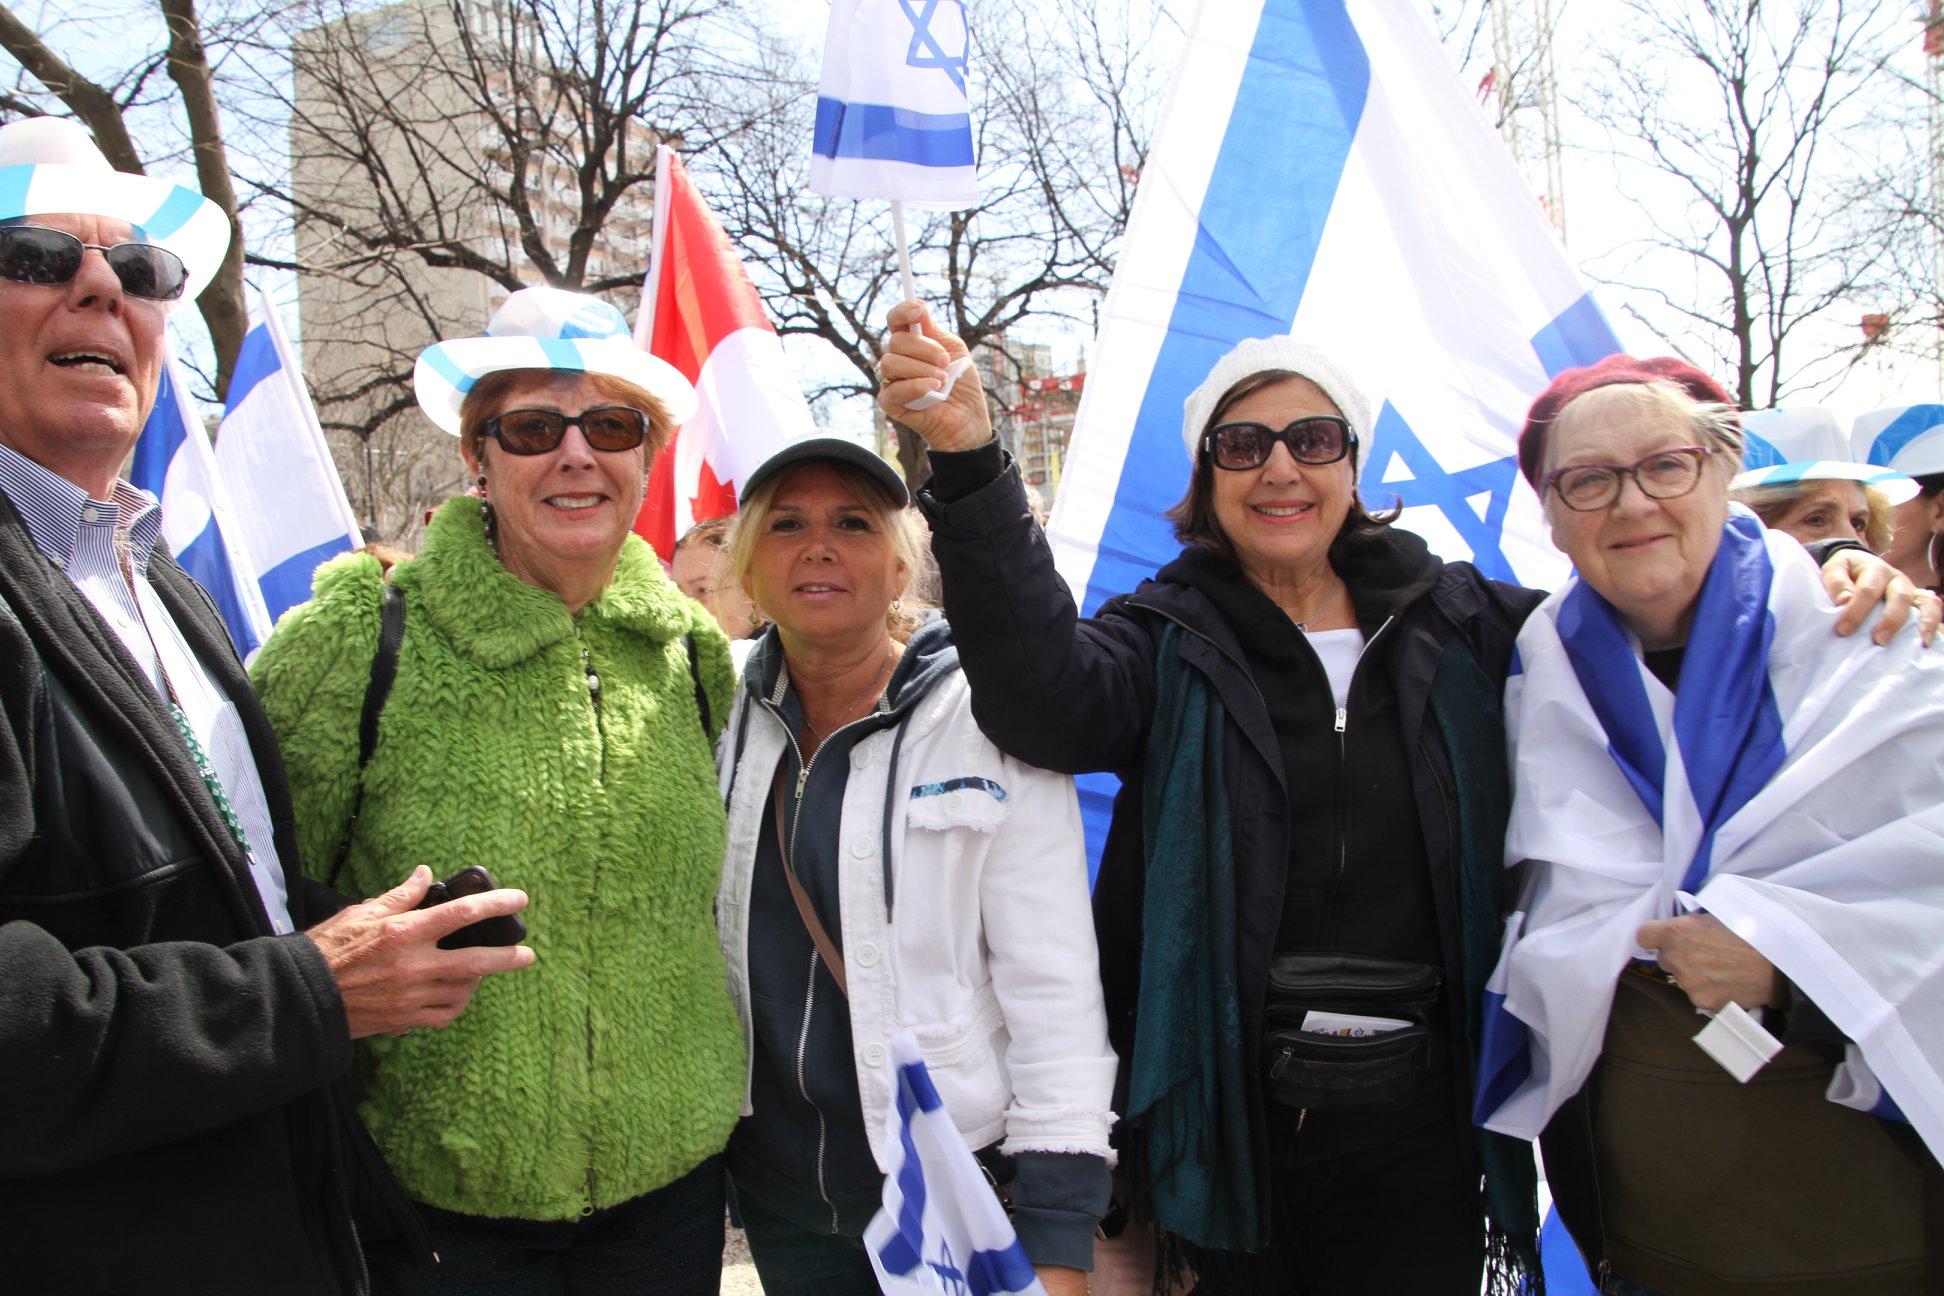 israel day parade-20201130-143843.jpg